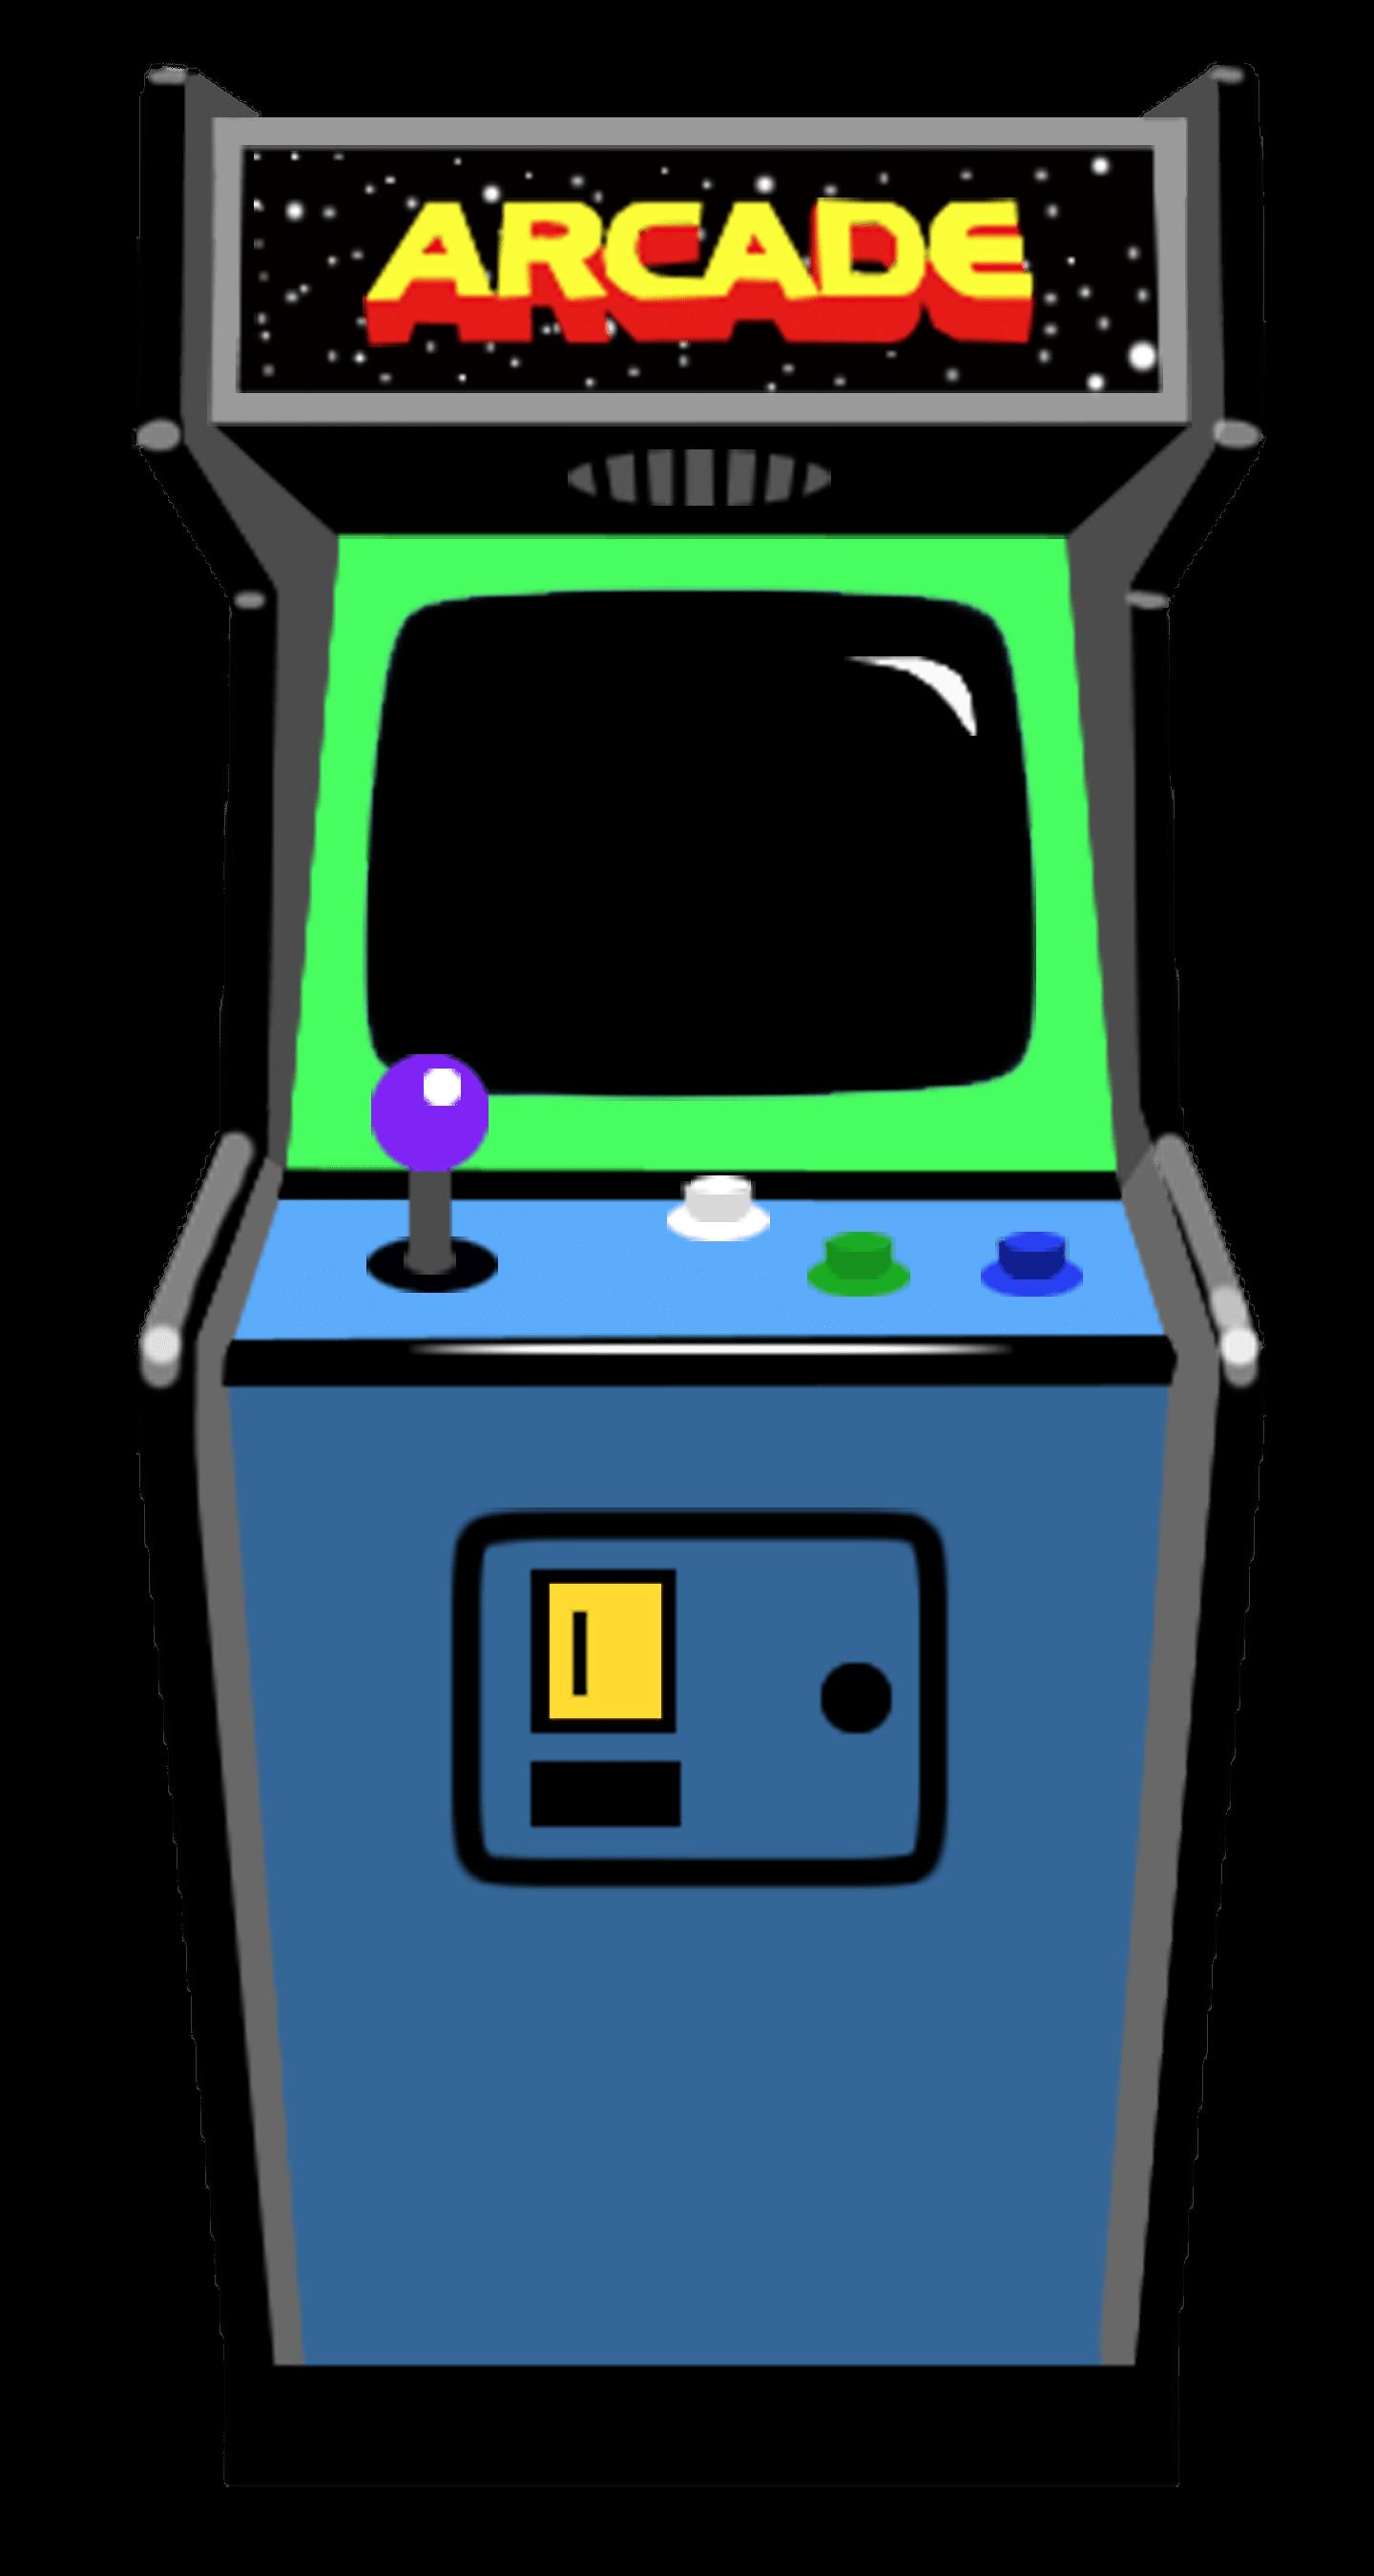 Game clipart arcade game #4